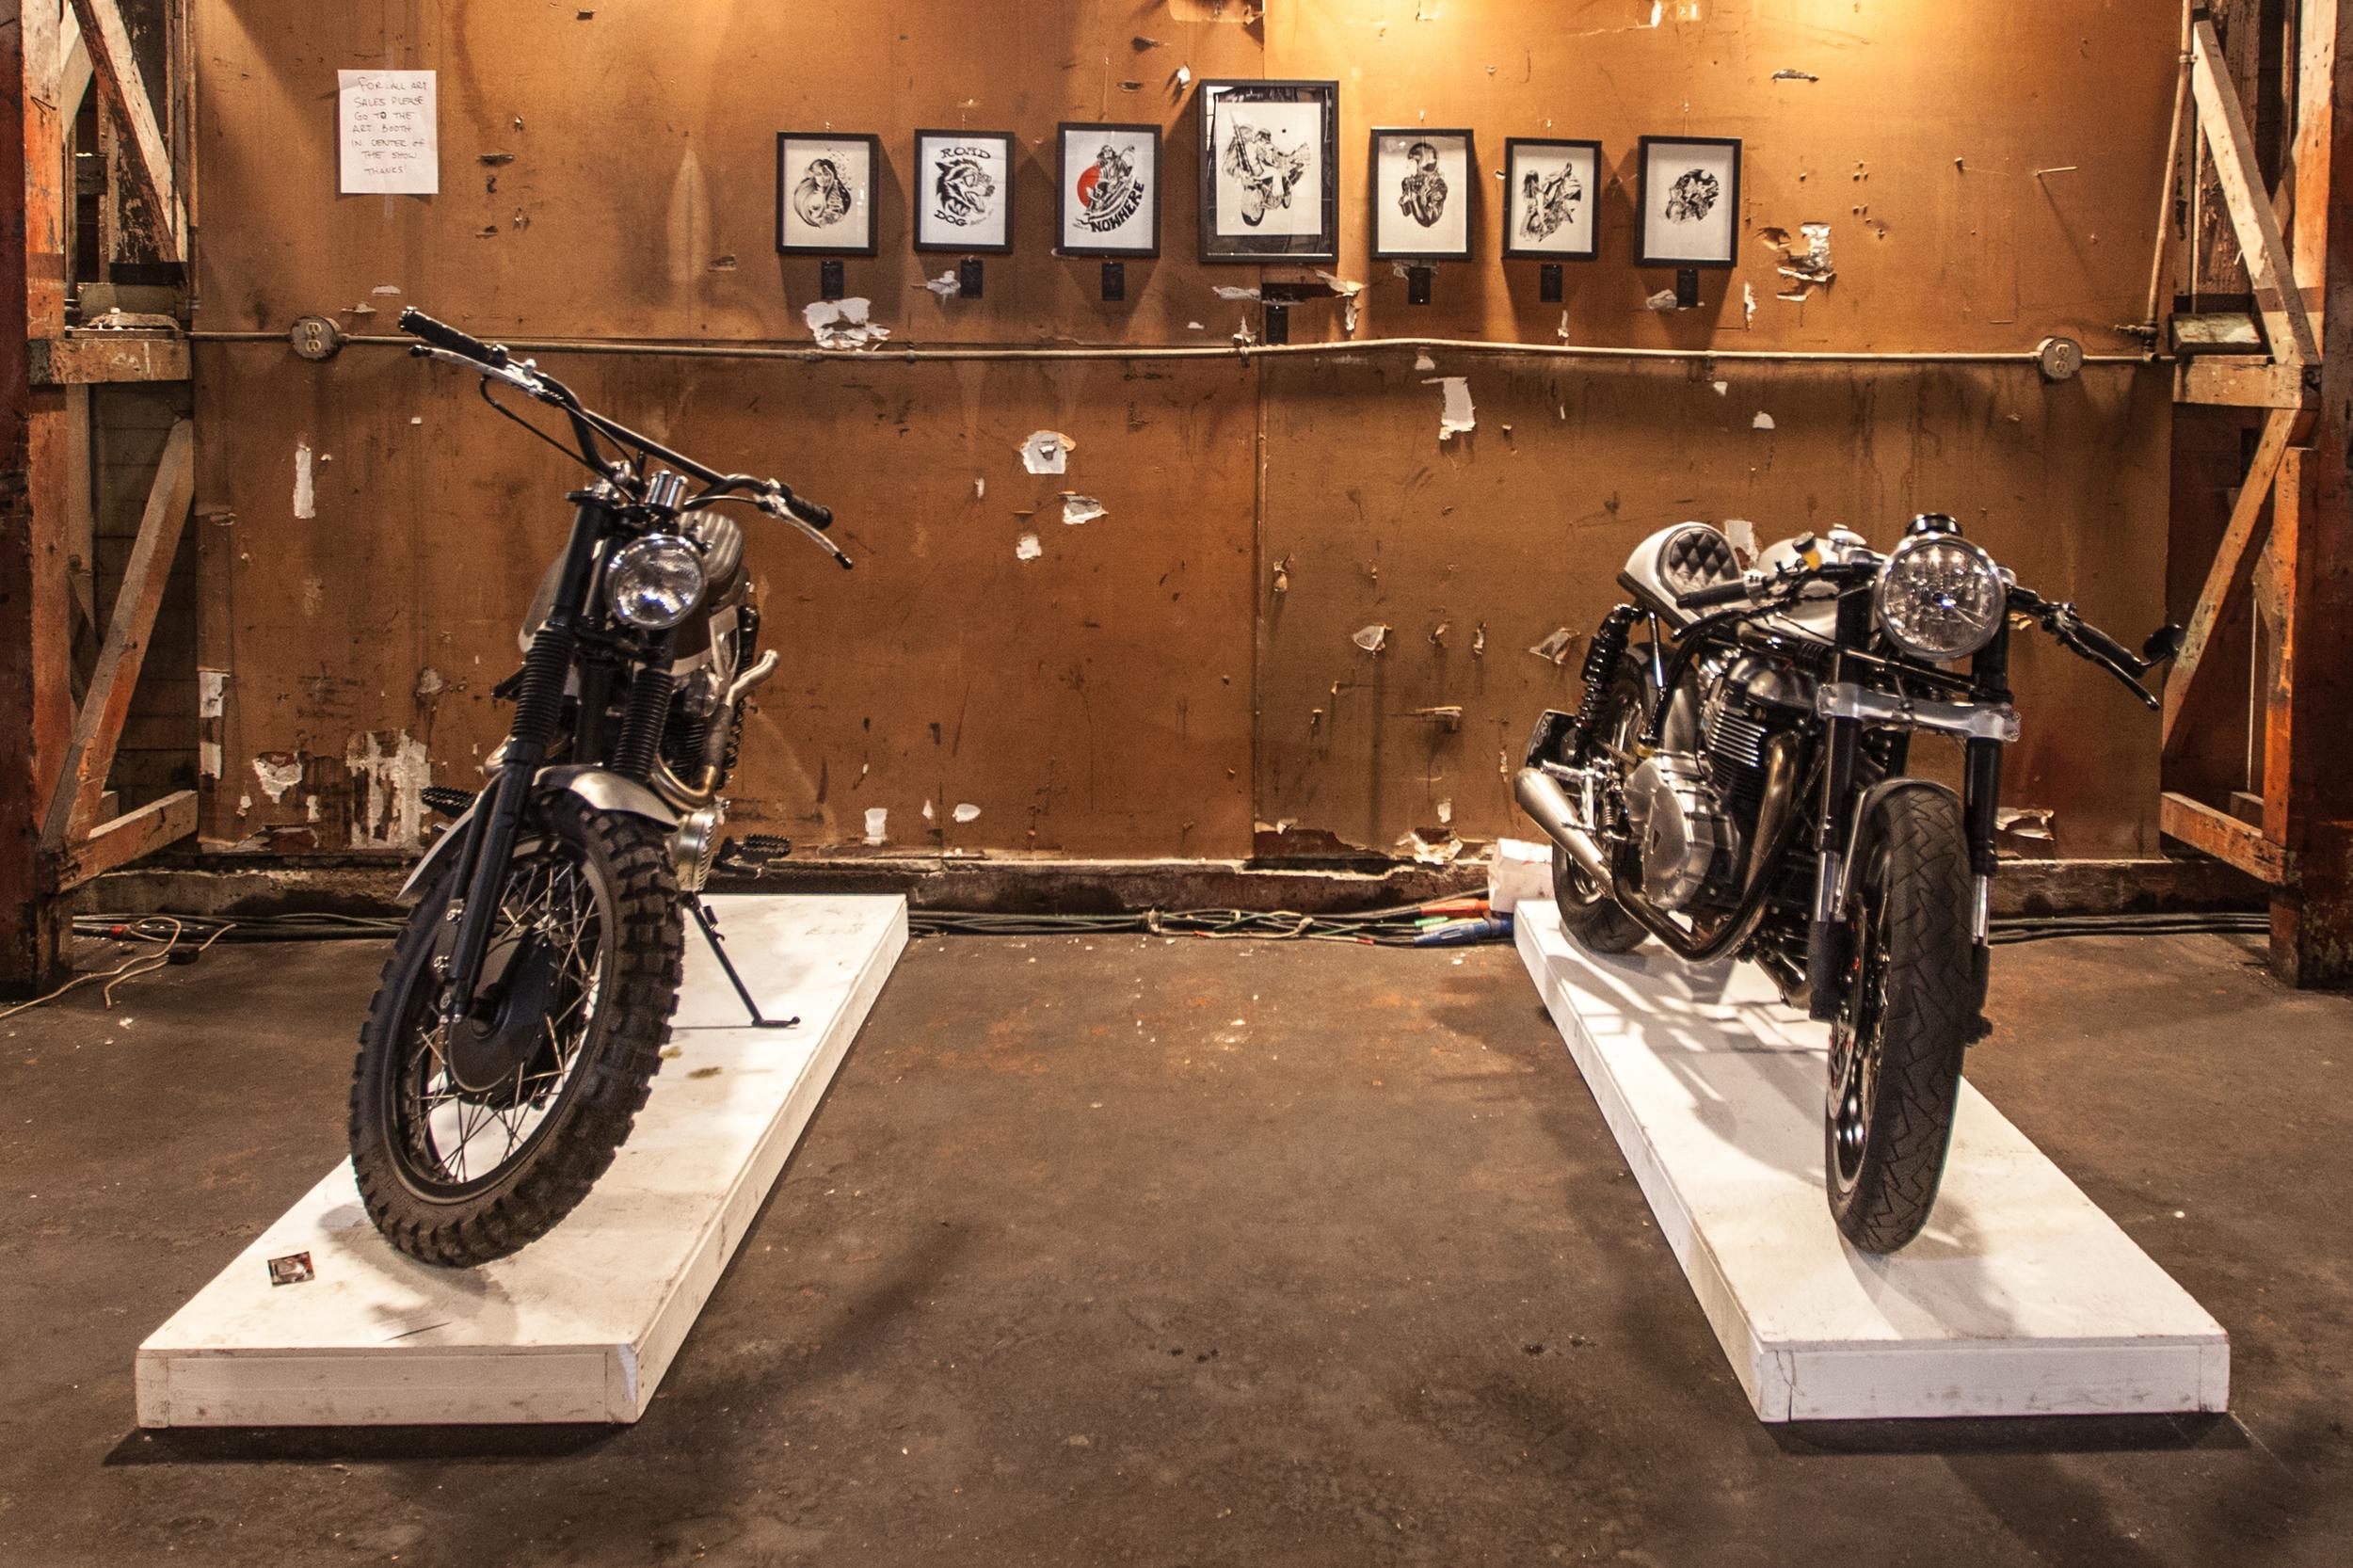 02-14-15 The 1 Moto Show - 2_-110-46.jpg